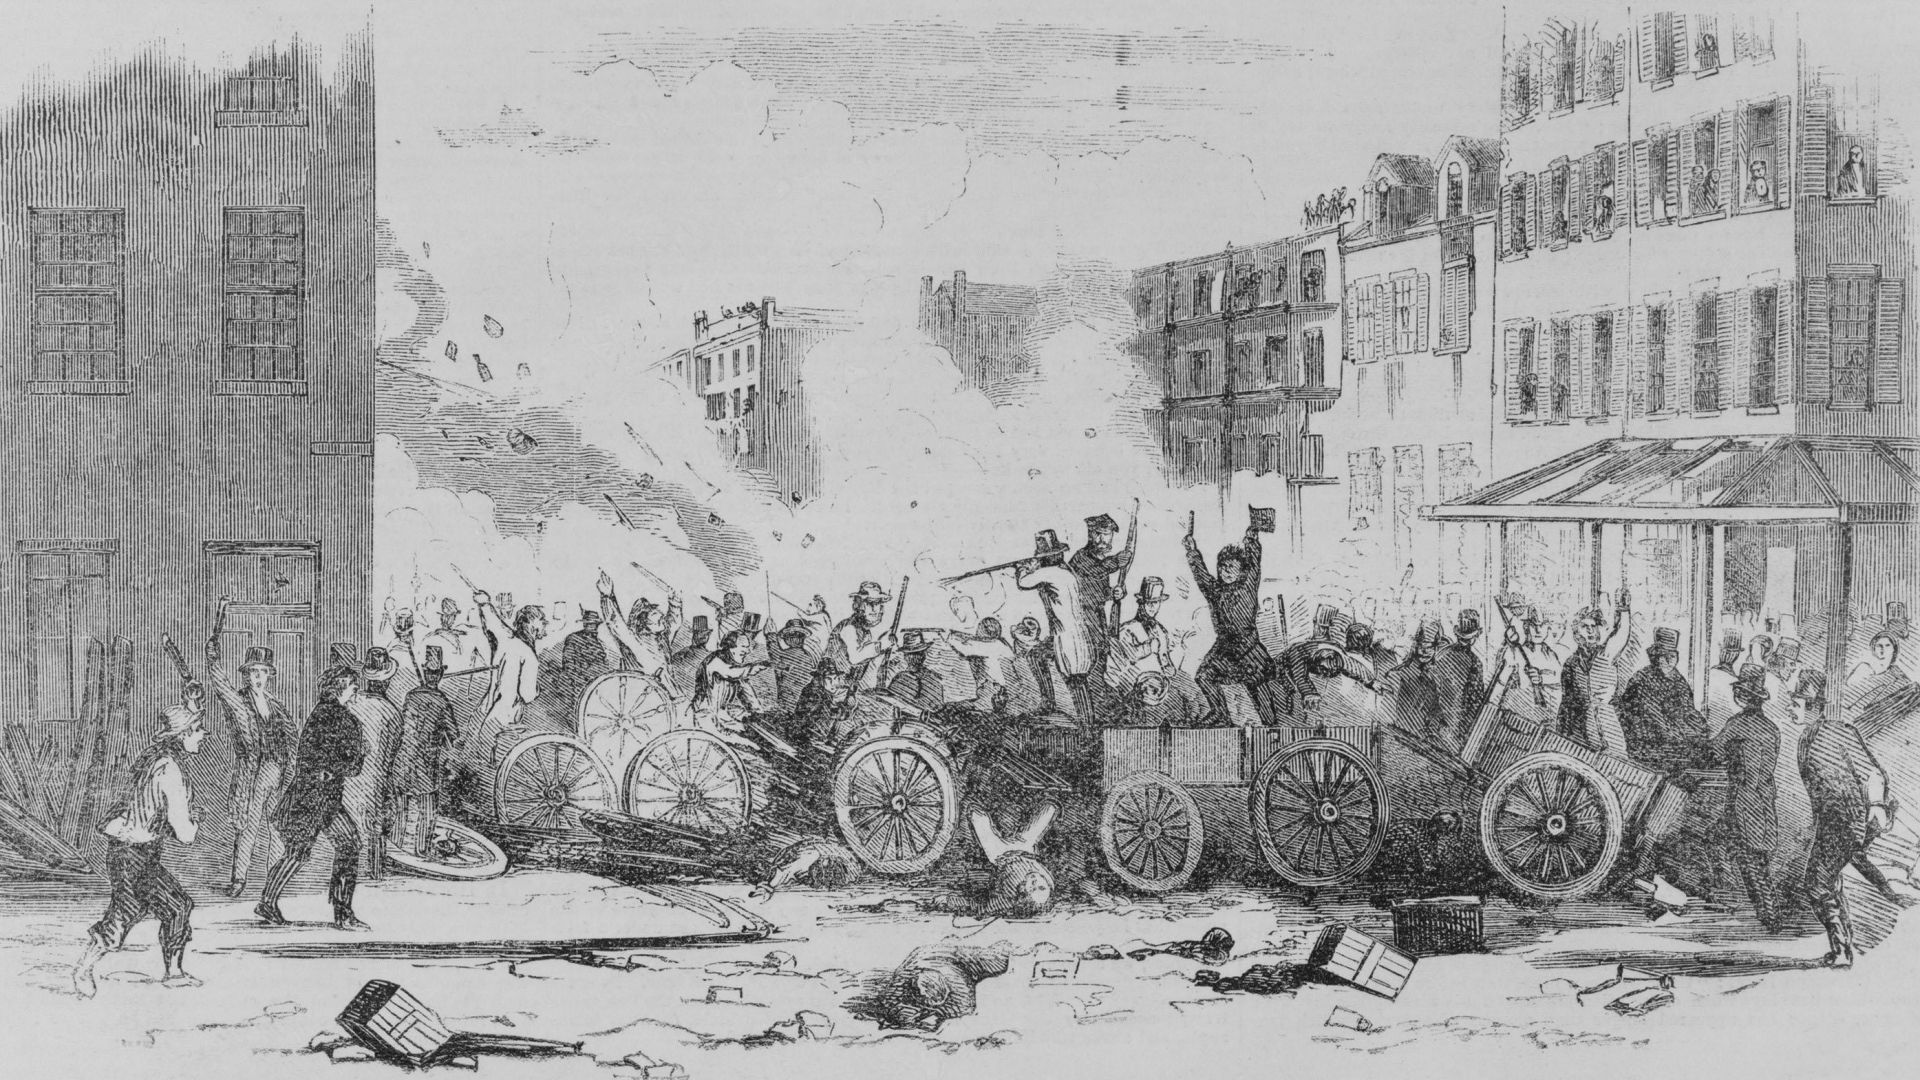 The battle on Bayard Street of the Irish gang, the 'Dead Rabbits,' against the Bowery Boys, a nativist, anti-Catholic and anti-Irish gang, New York, 1857. (Credit: Everett Collection Inc/Alamy Stock Photo)